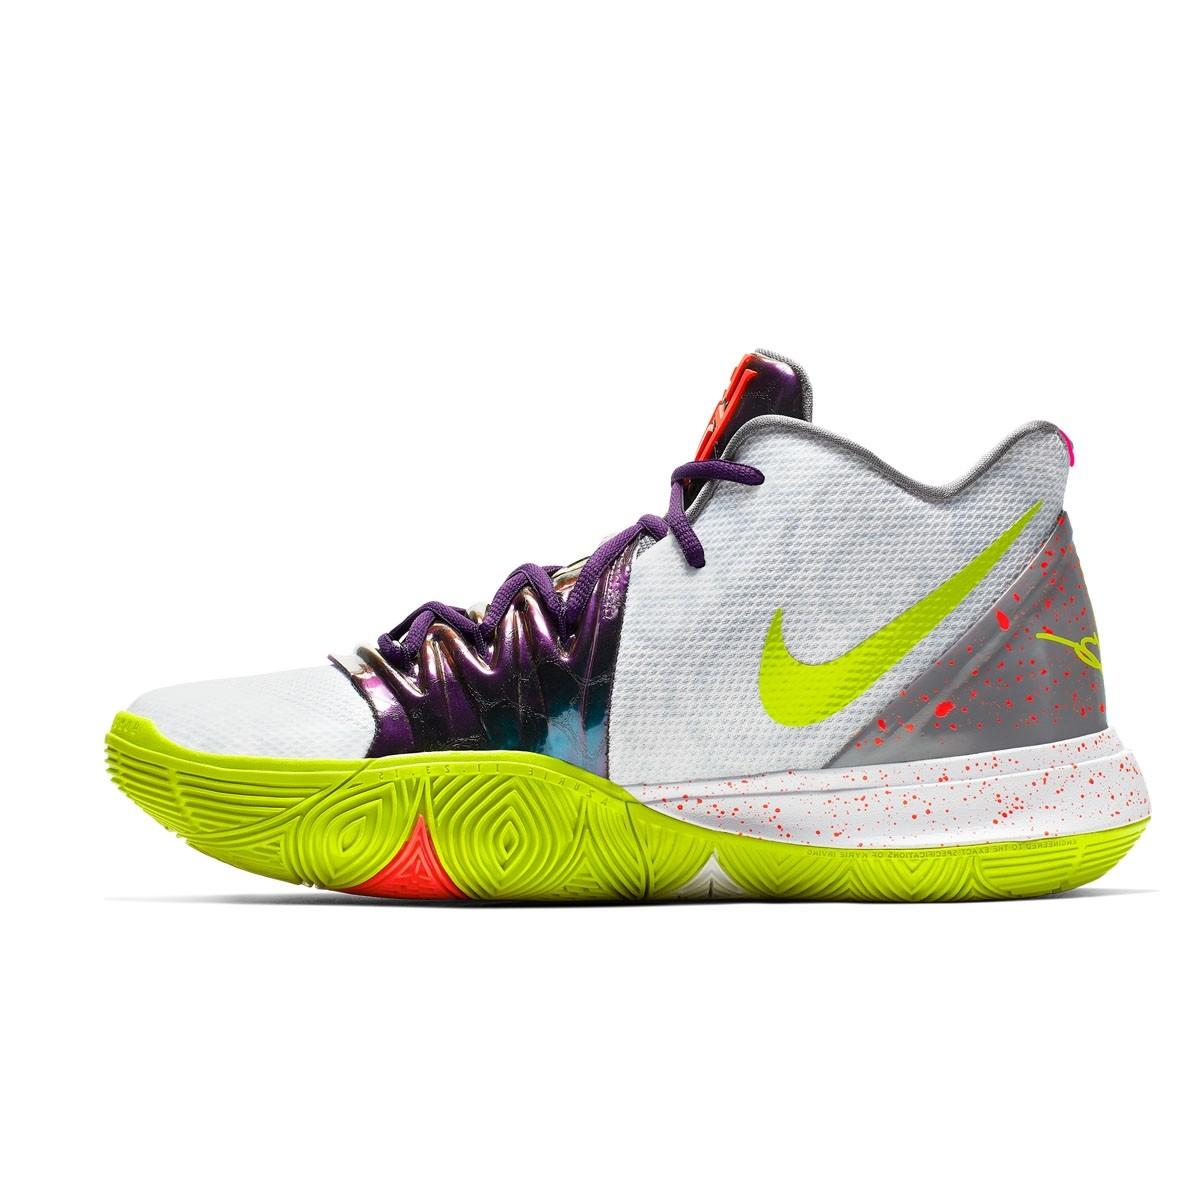 Nike Kyrie 5 'Mamba Mentality'